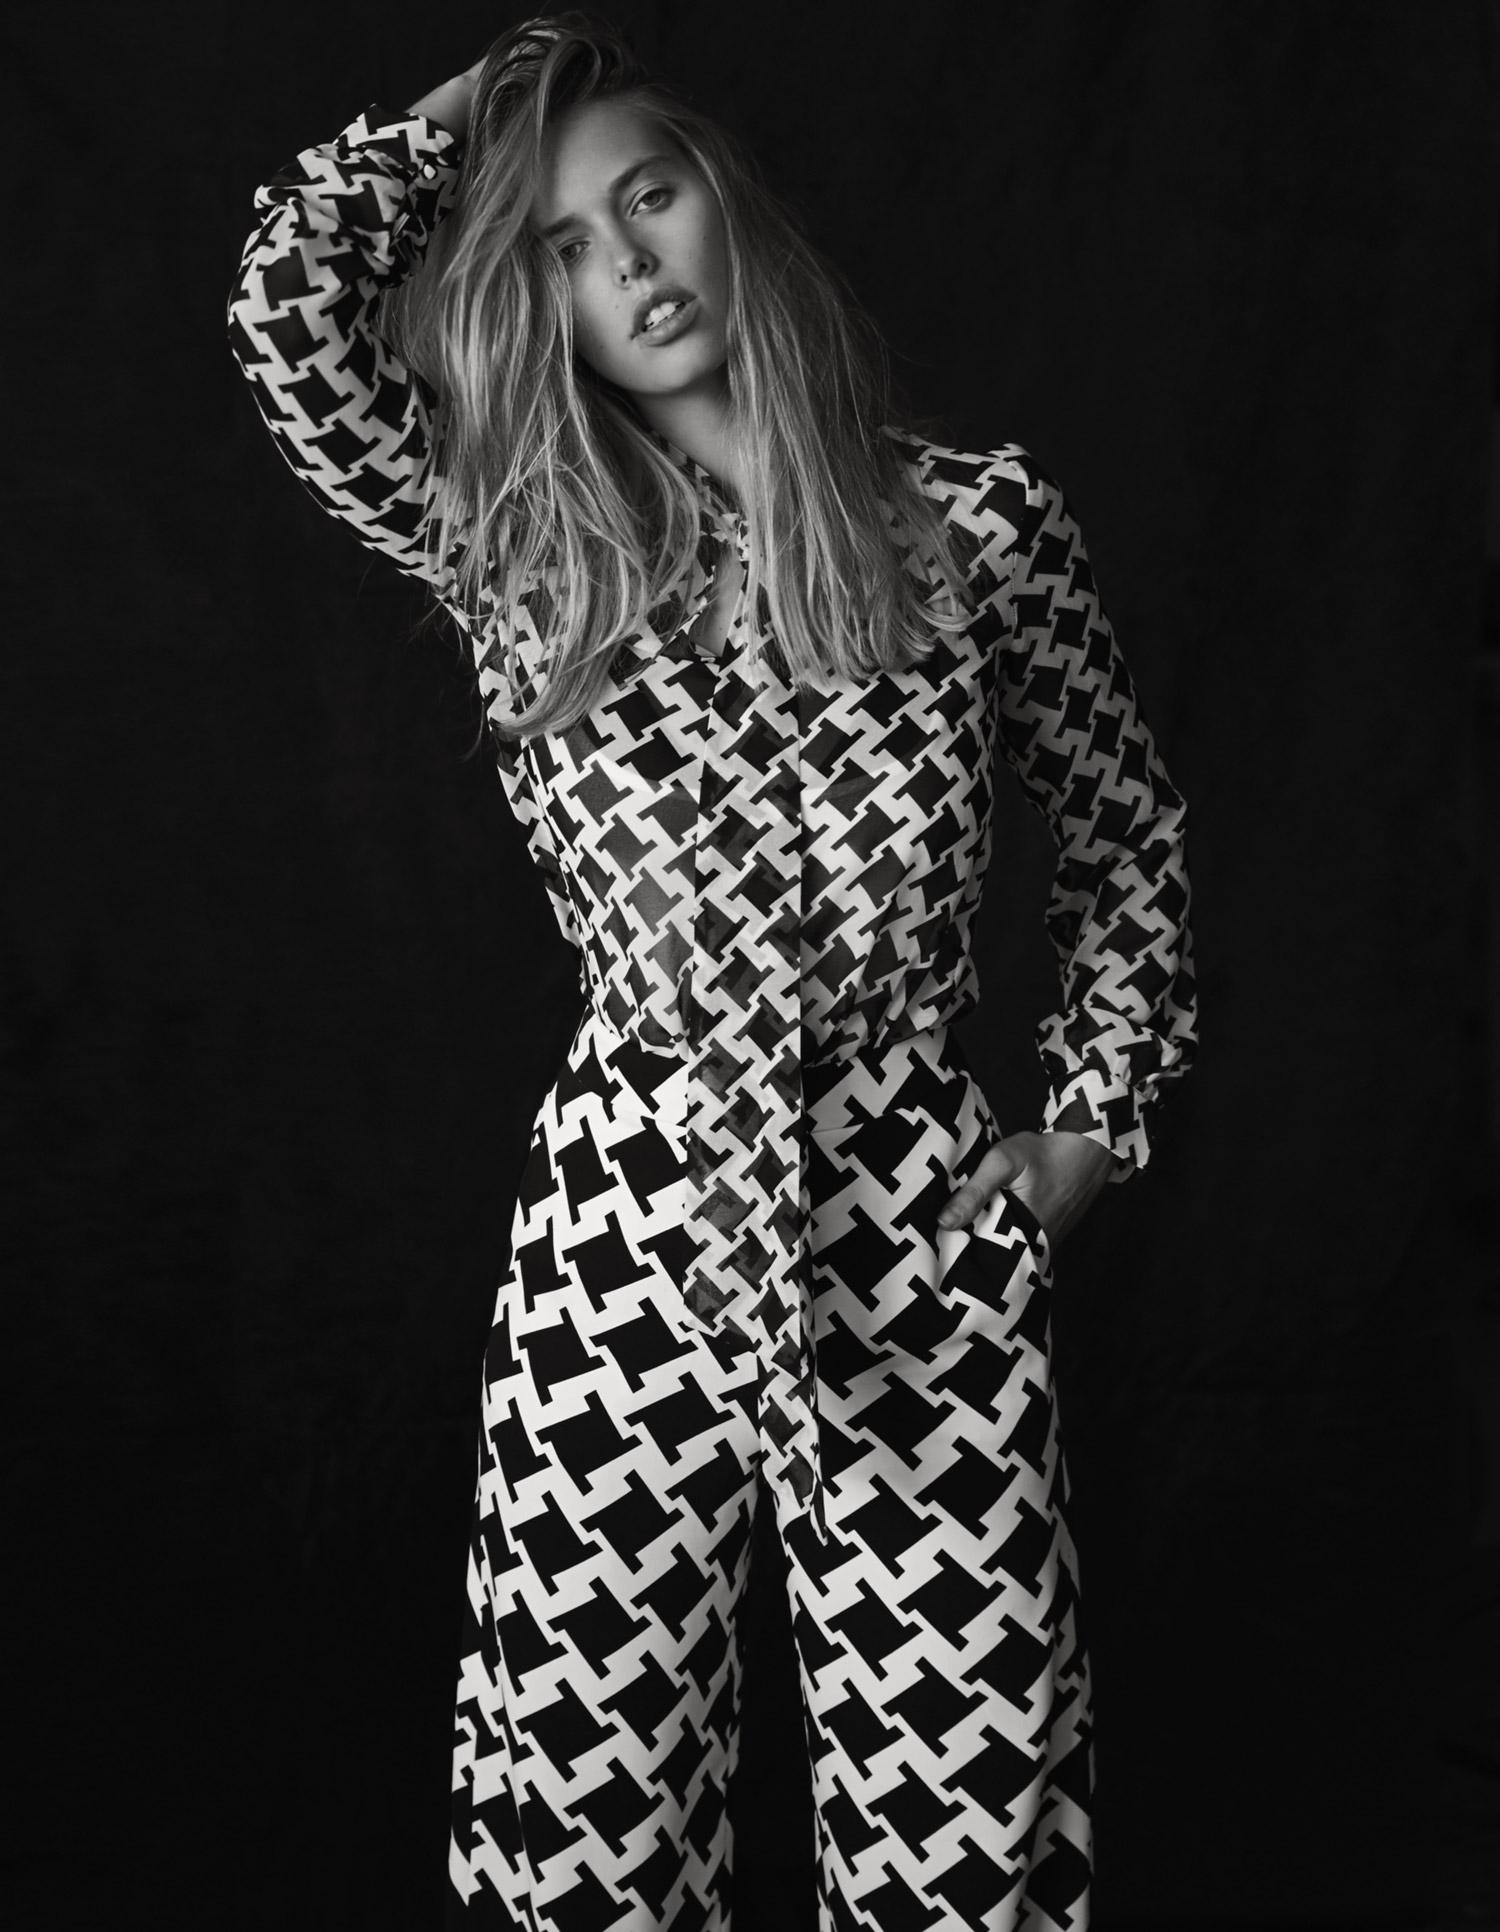 Phoebe Ghorayeb Model wearing Tylr Georges Antoni Photographer.jpg